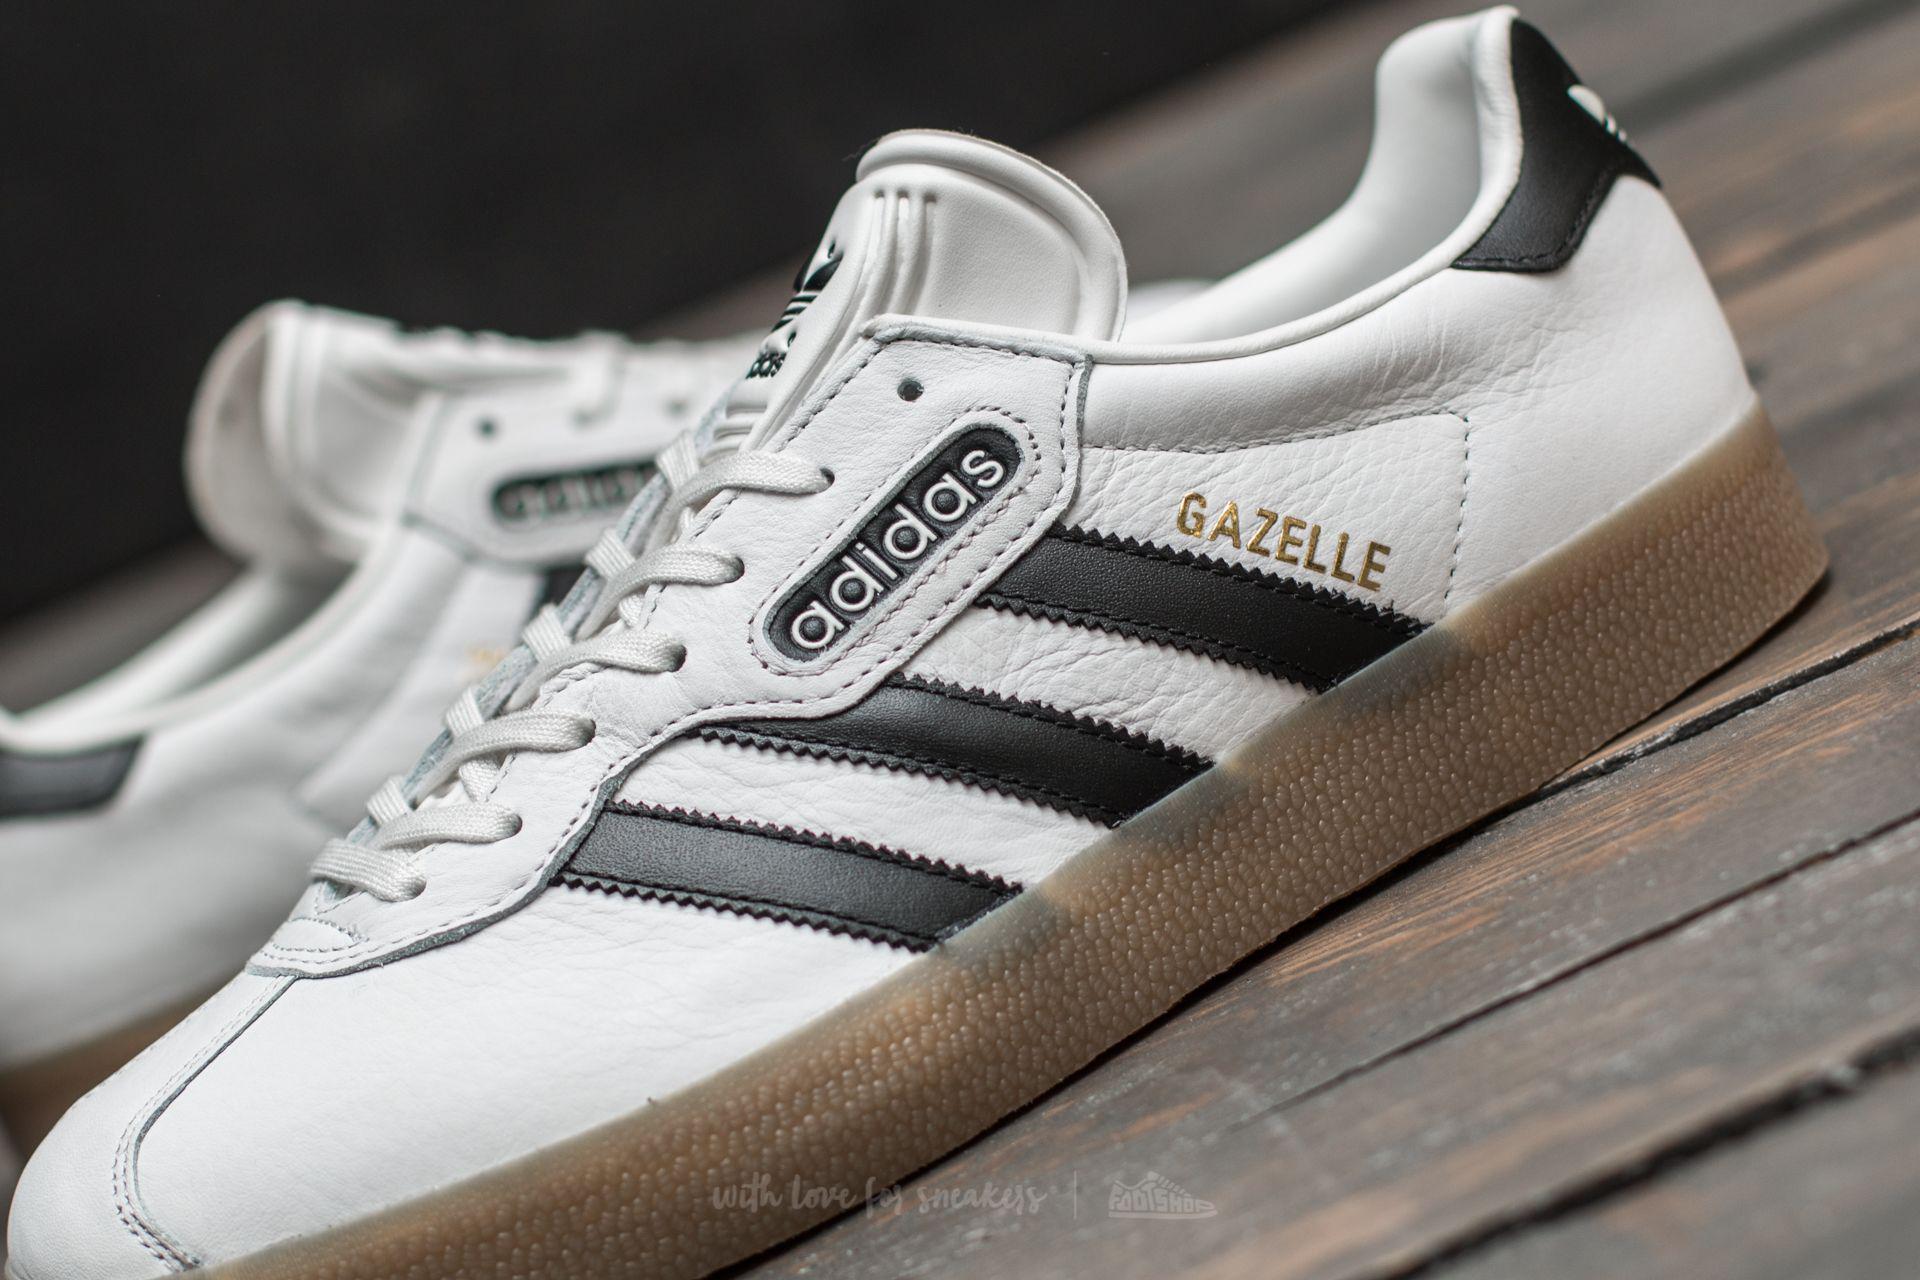 Filadelfia Insignificante algodón  adidas Originals Leather Adidas Gazelle Super Vintage White/ Core Black/ Gum  for Men - Lyst